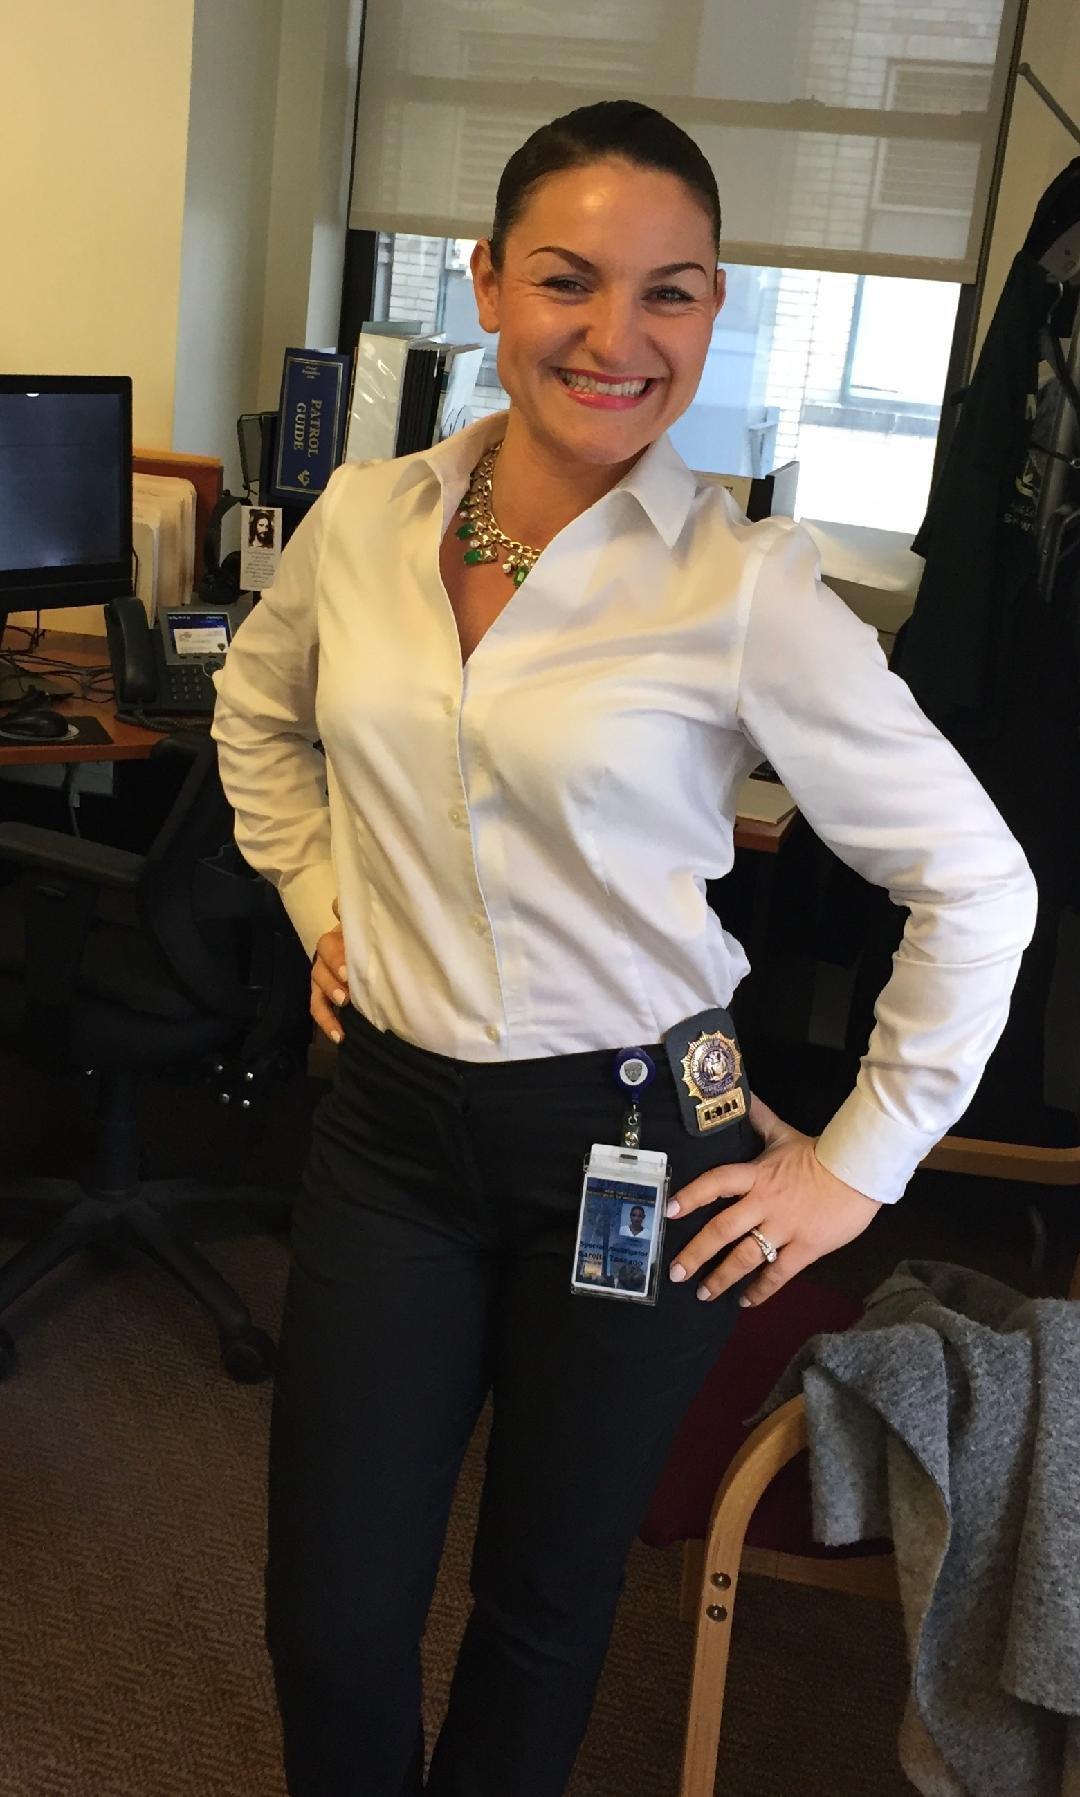 Szekler Woman Joins NYPD